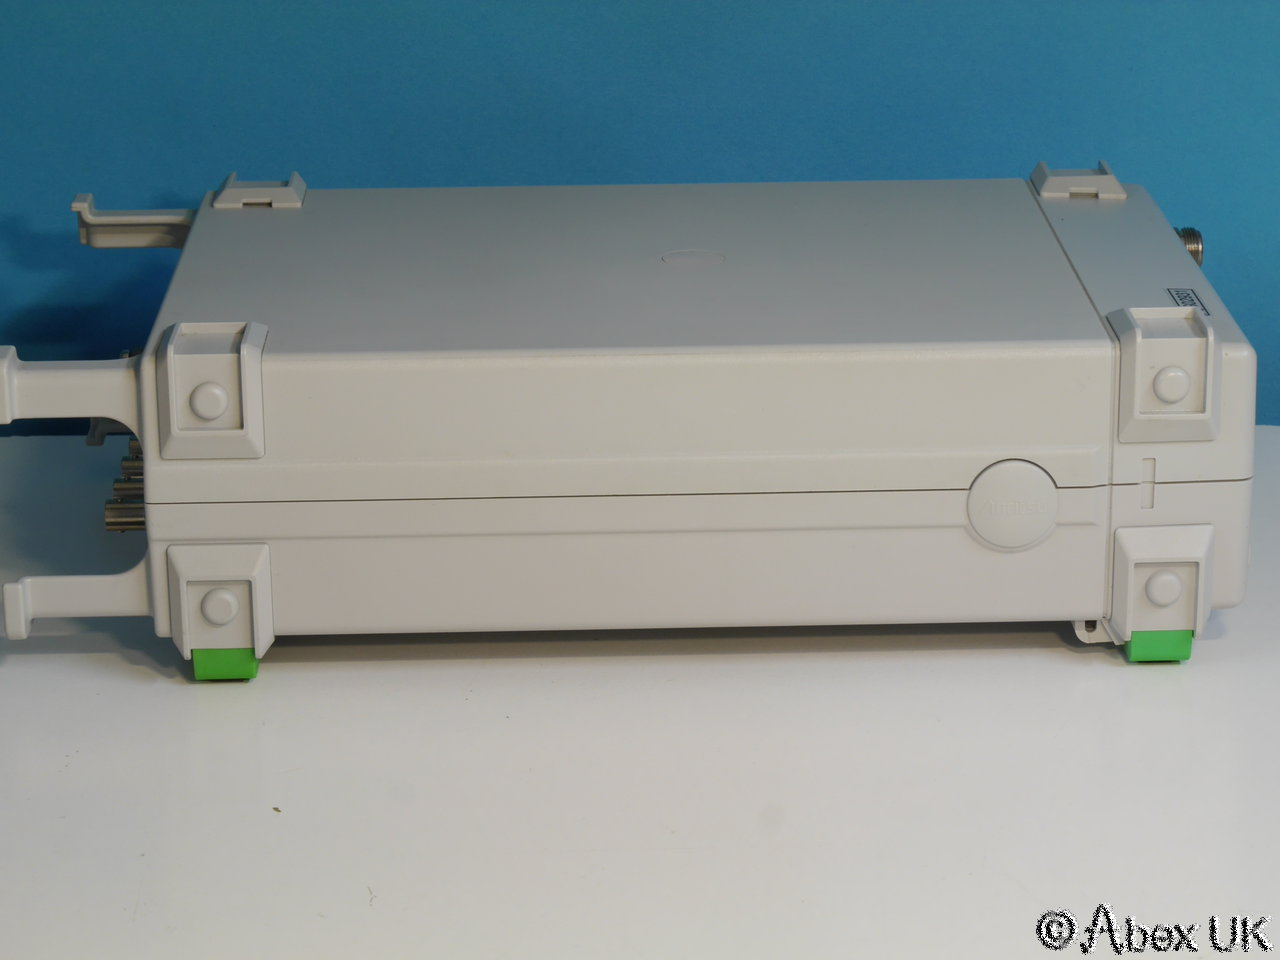 Anritsu Ml2437a Single Input Rf Power Meter Gpib 2 0 500mhz Pic16f876